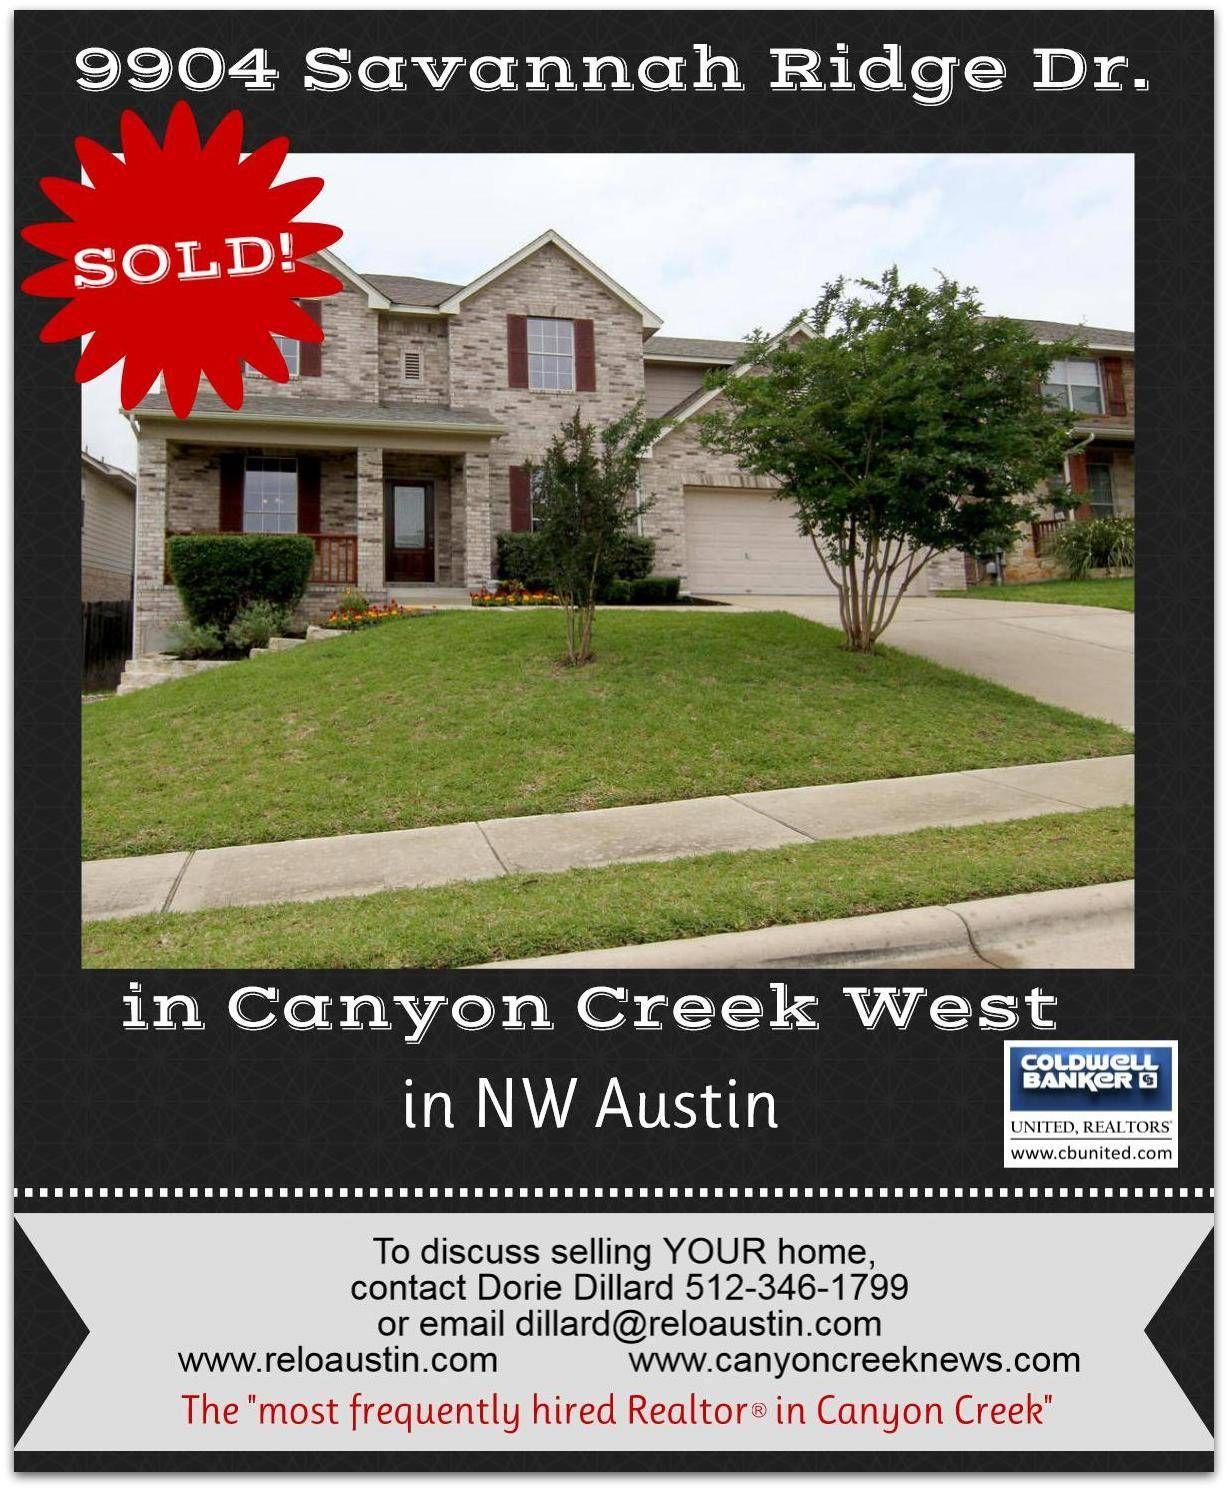 sold canyon creek west in nw austin 9904 savannah ridge savannah